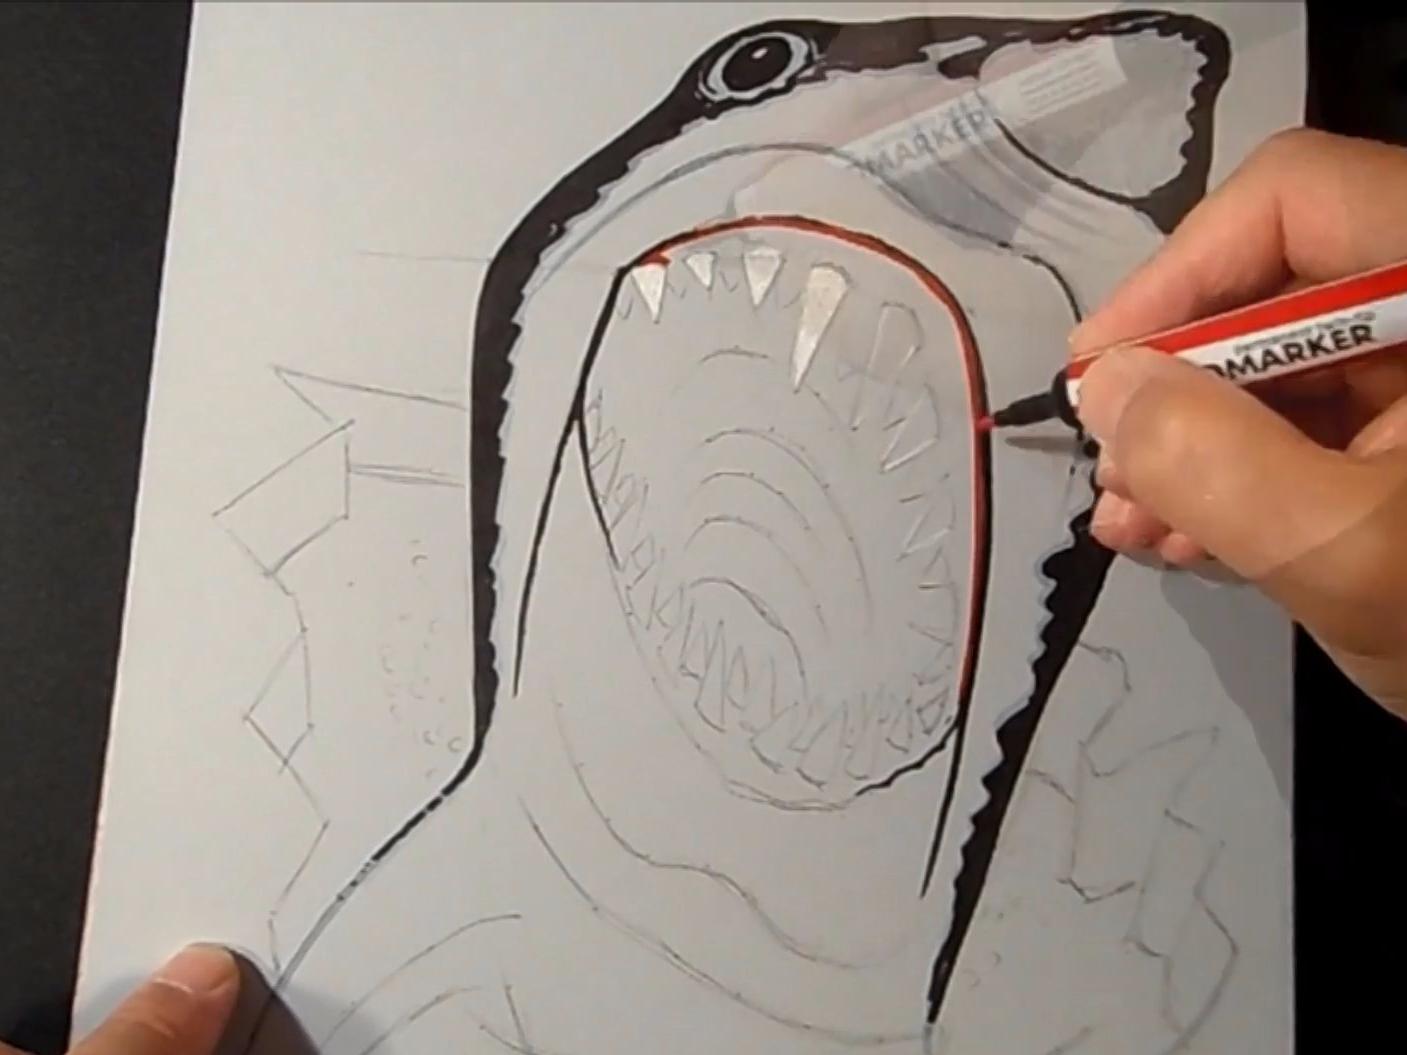 Drawn optical illusion basic Shark  Business Insider anamorphic